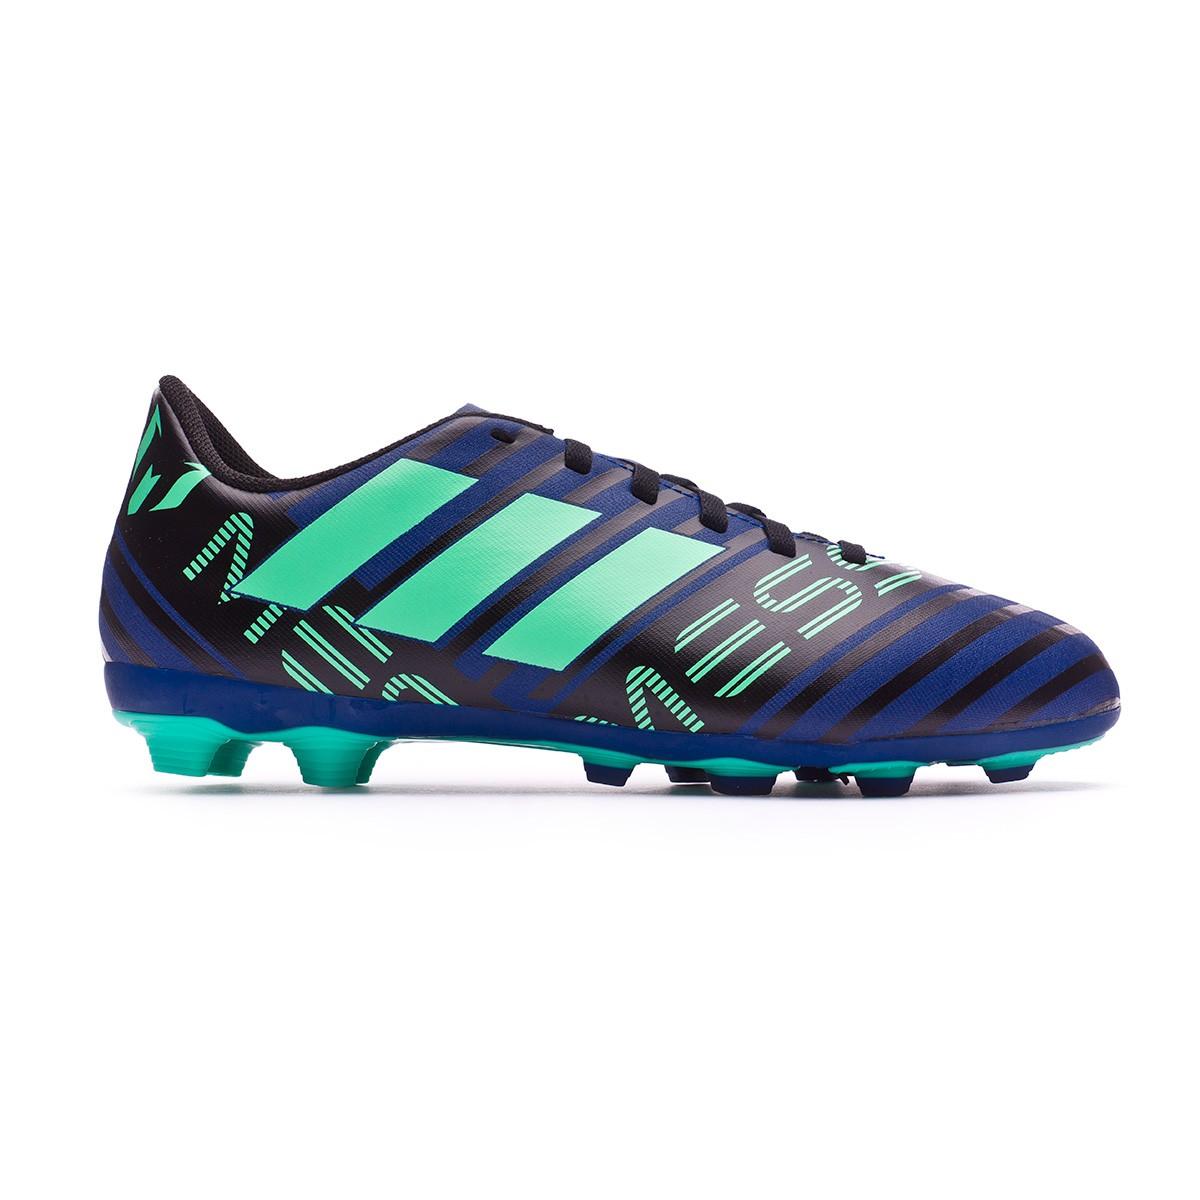 4876c92672c Football Boots adidas Kids Nemeziz Messi 17.4 FxG Unity ink-Hi-res green-Core  black - Football store Fútbol Emotion